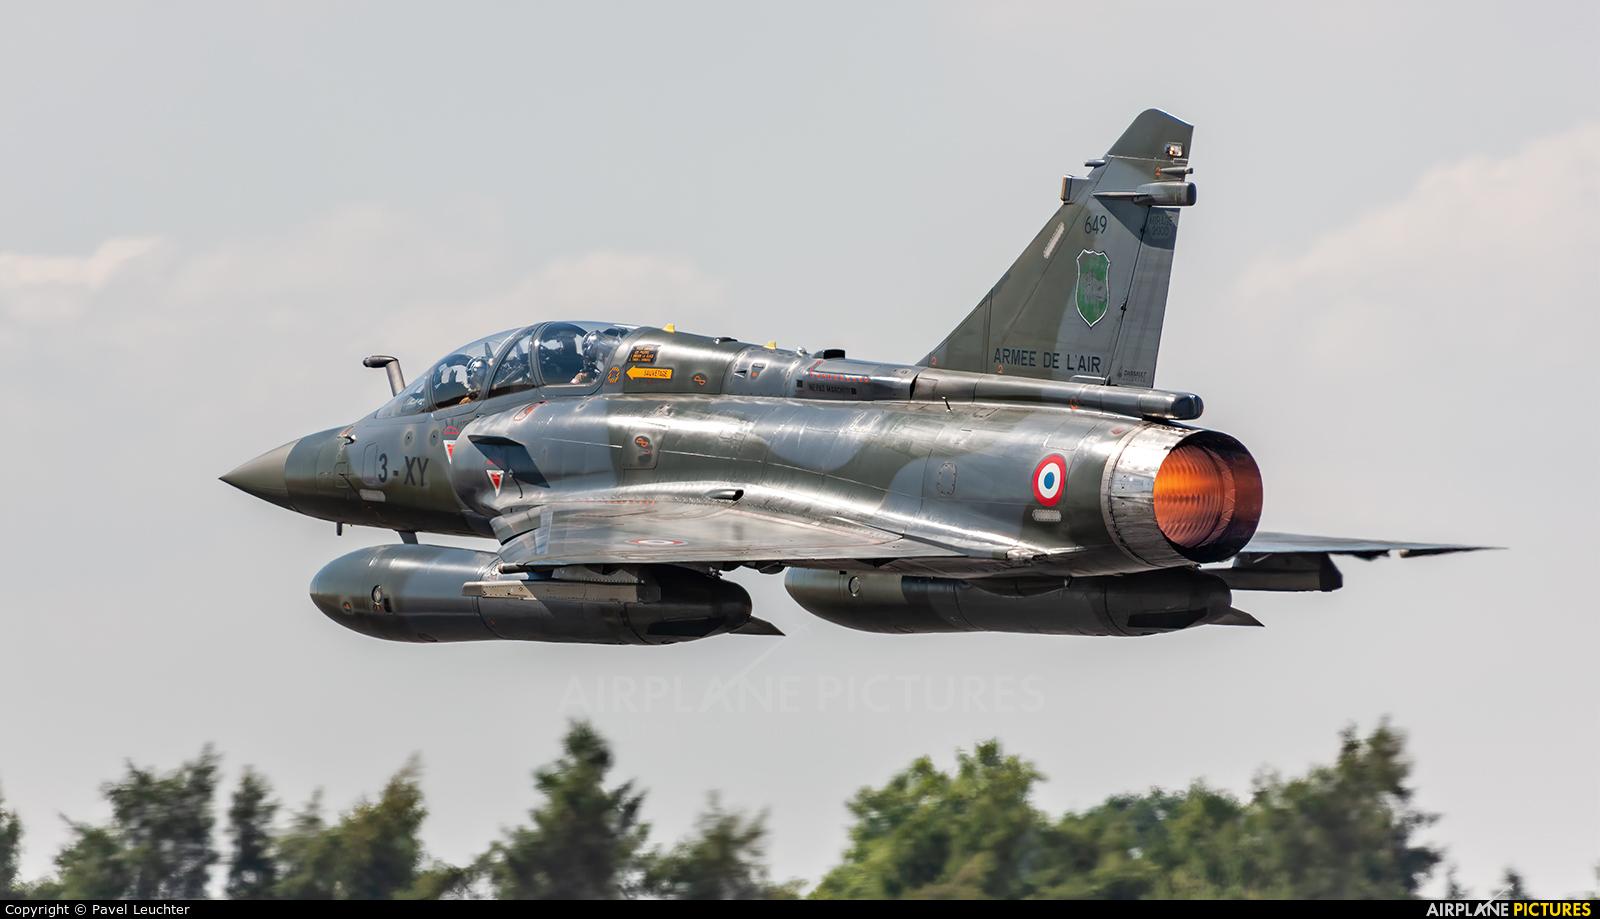 France - Air Force 649 aircraft at Fairford